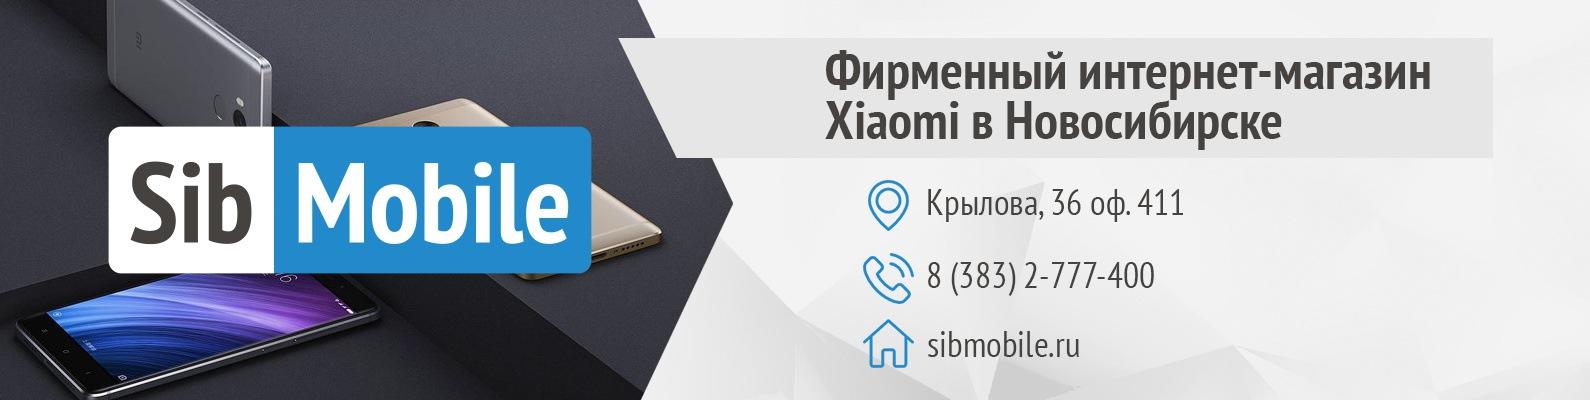 Интернет Магазин Сяоми Новосибирск